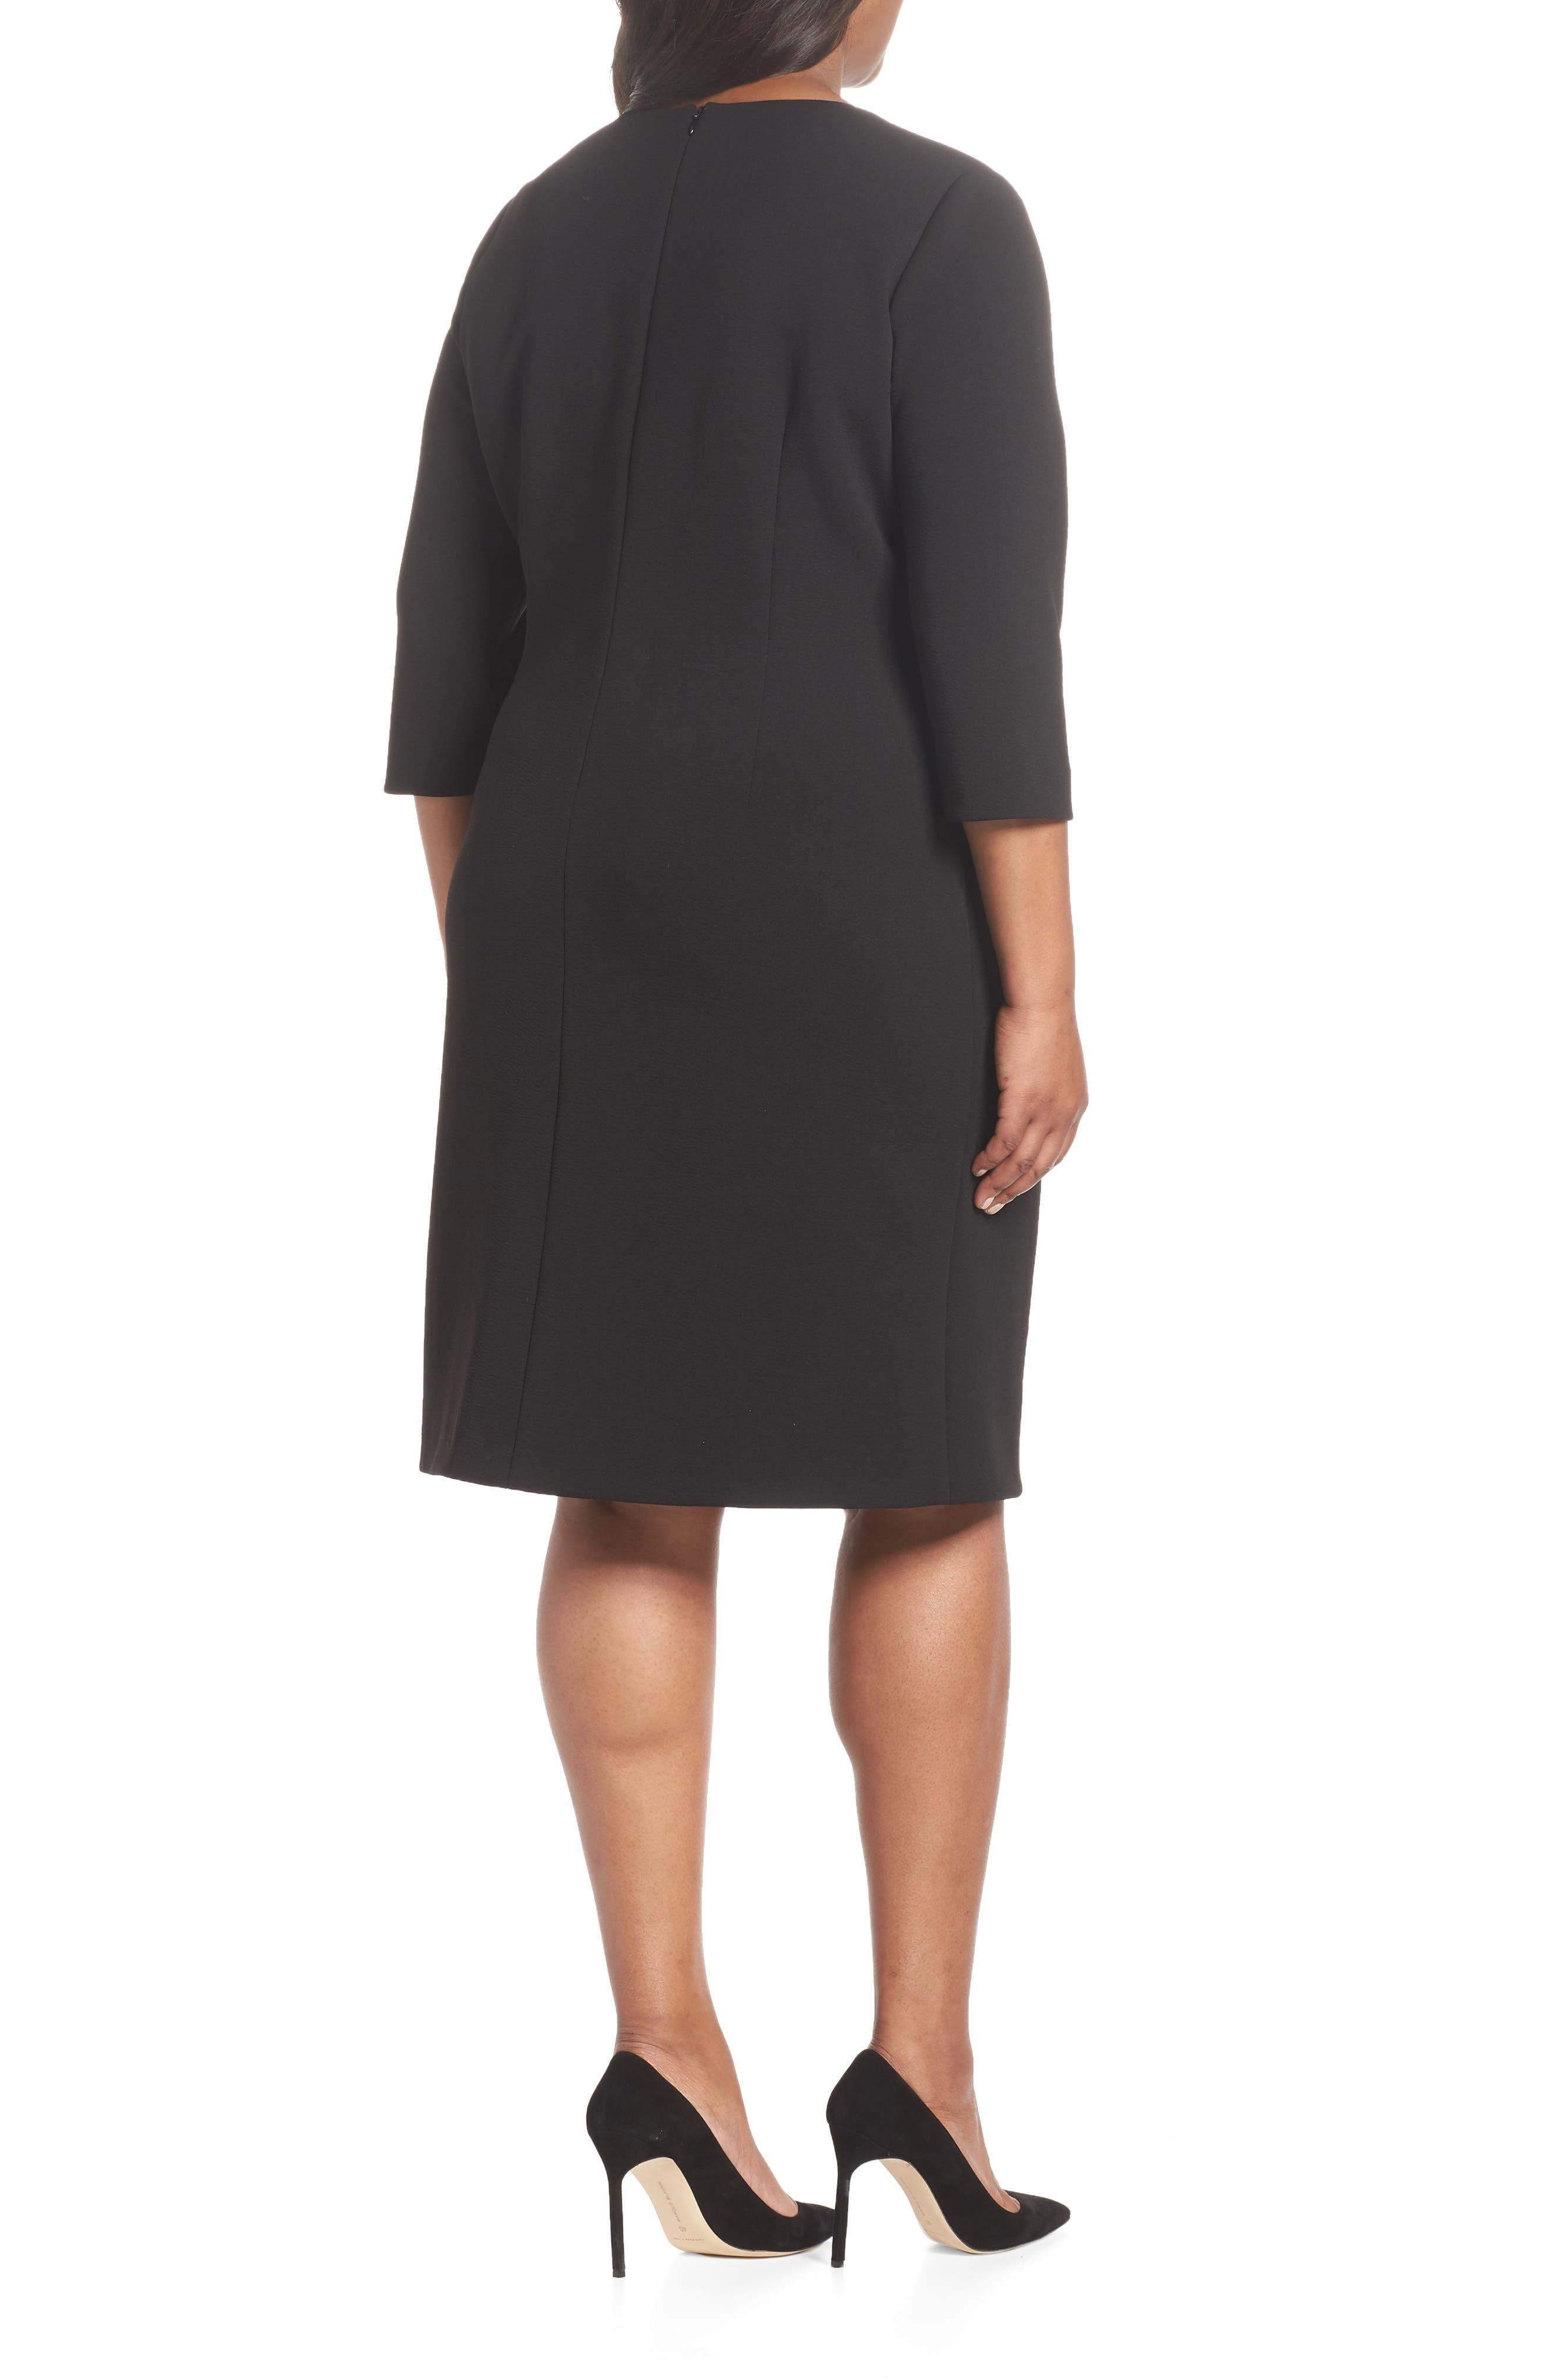 TAHARI, Ruched Surplice Crepe Sheath Dress, Alternate thumbnail 2, color, BLACK